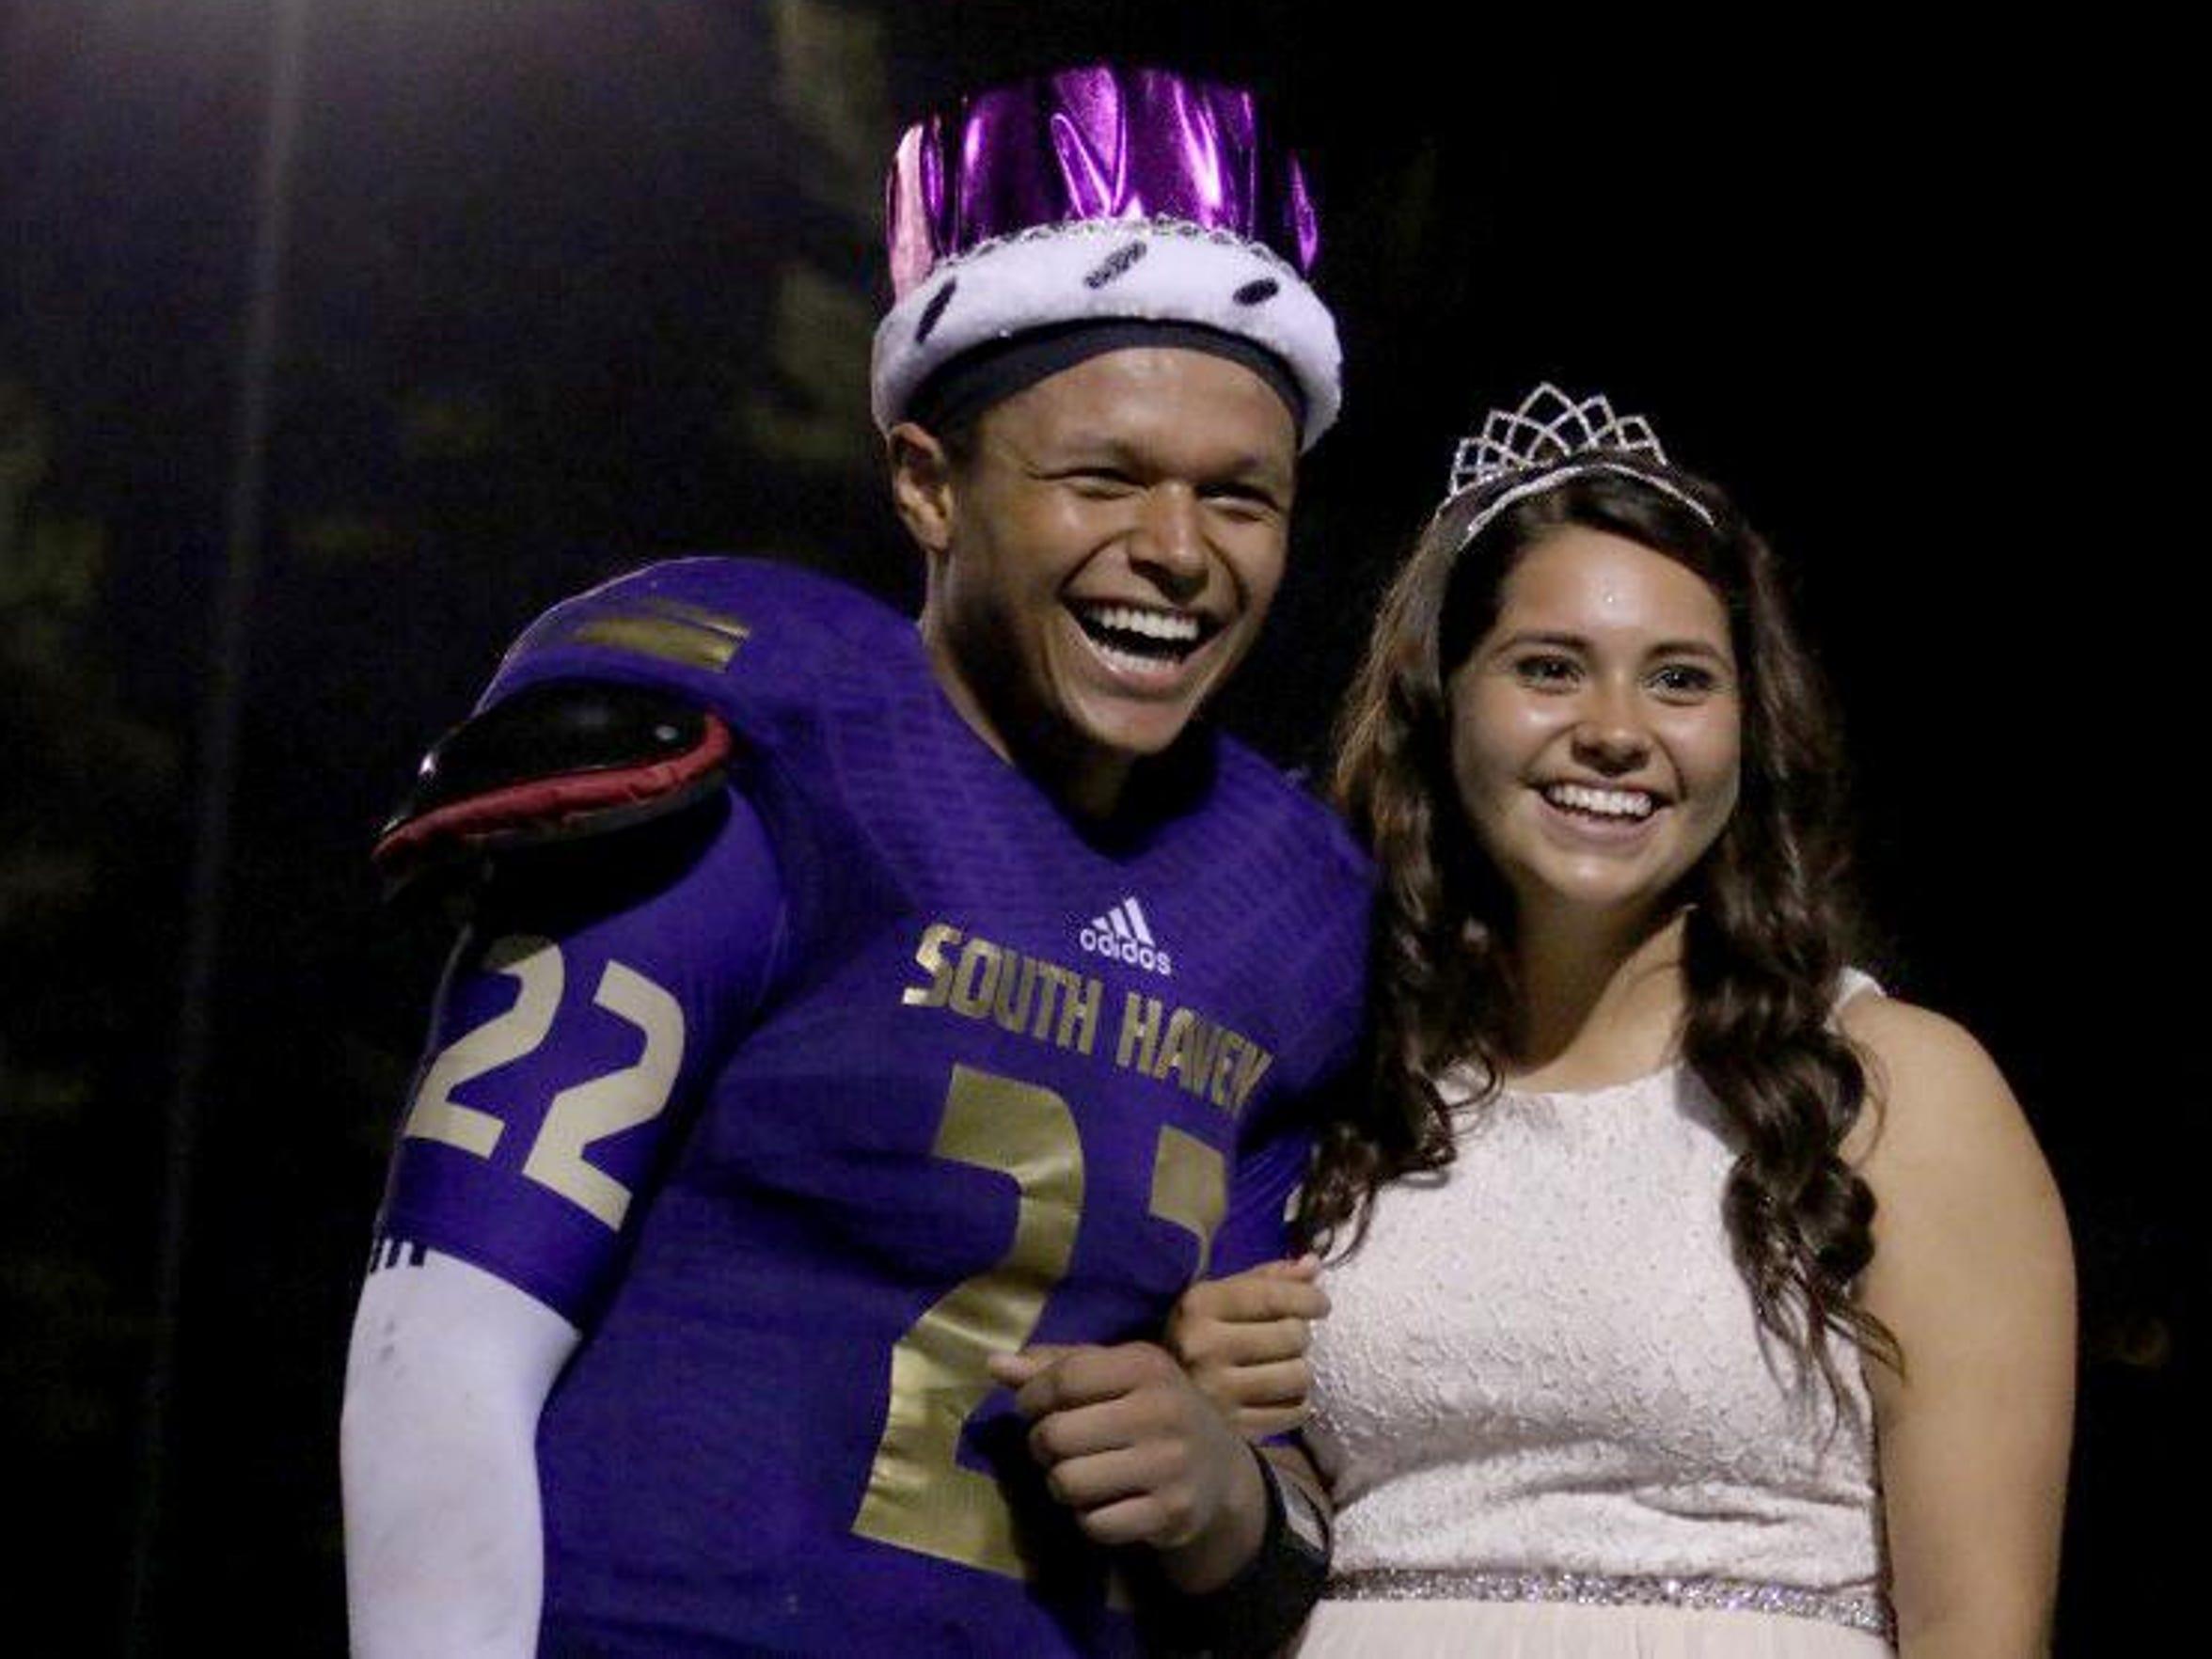 South Haven quarterback Devon Smiley was homecoming